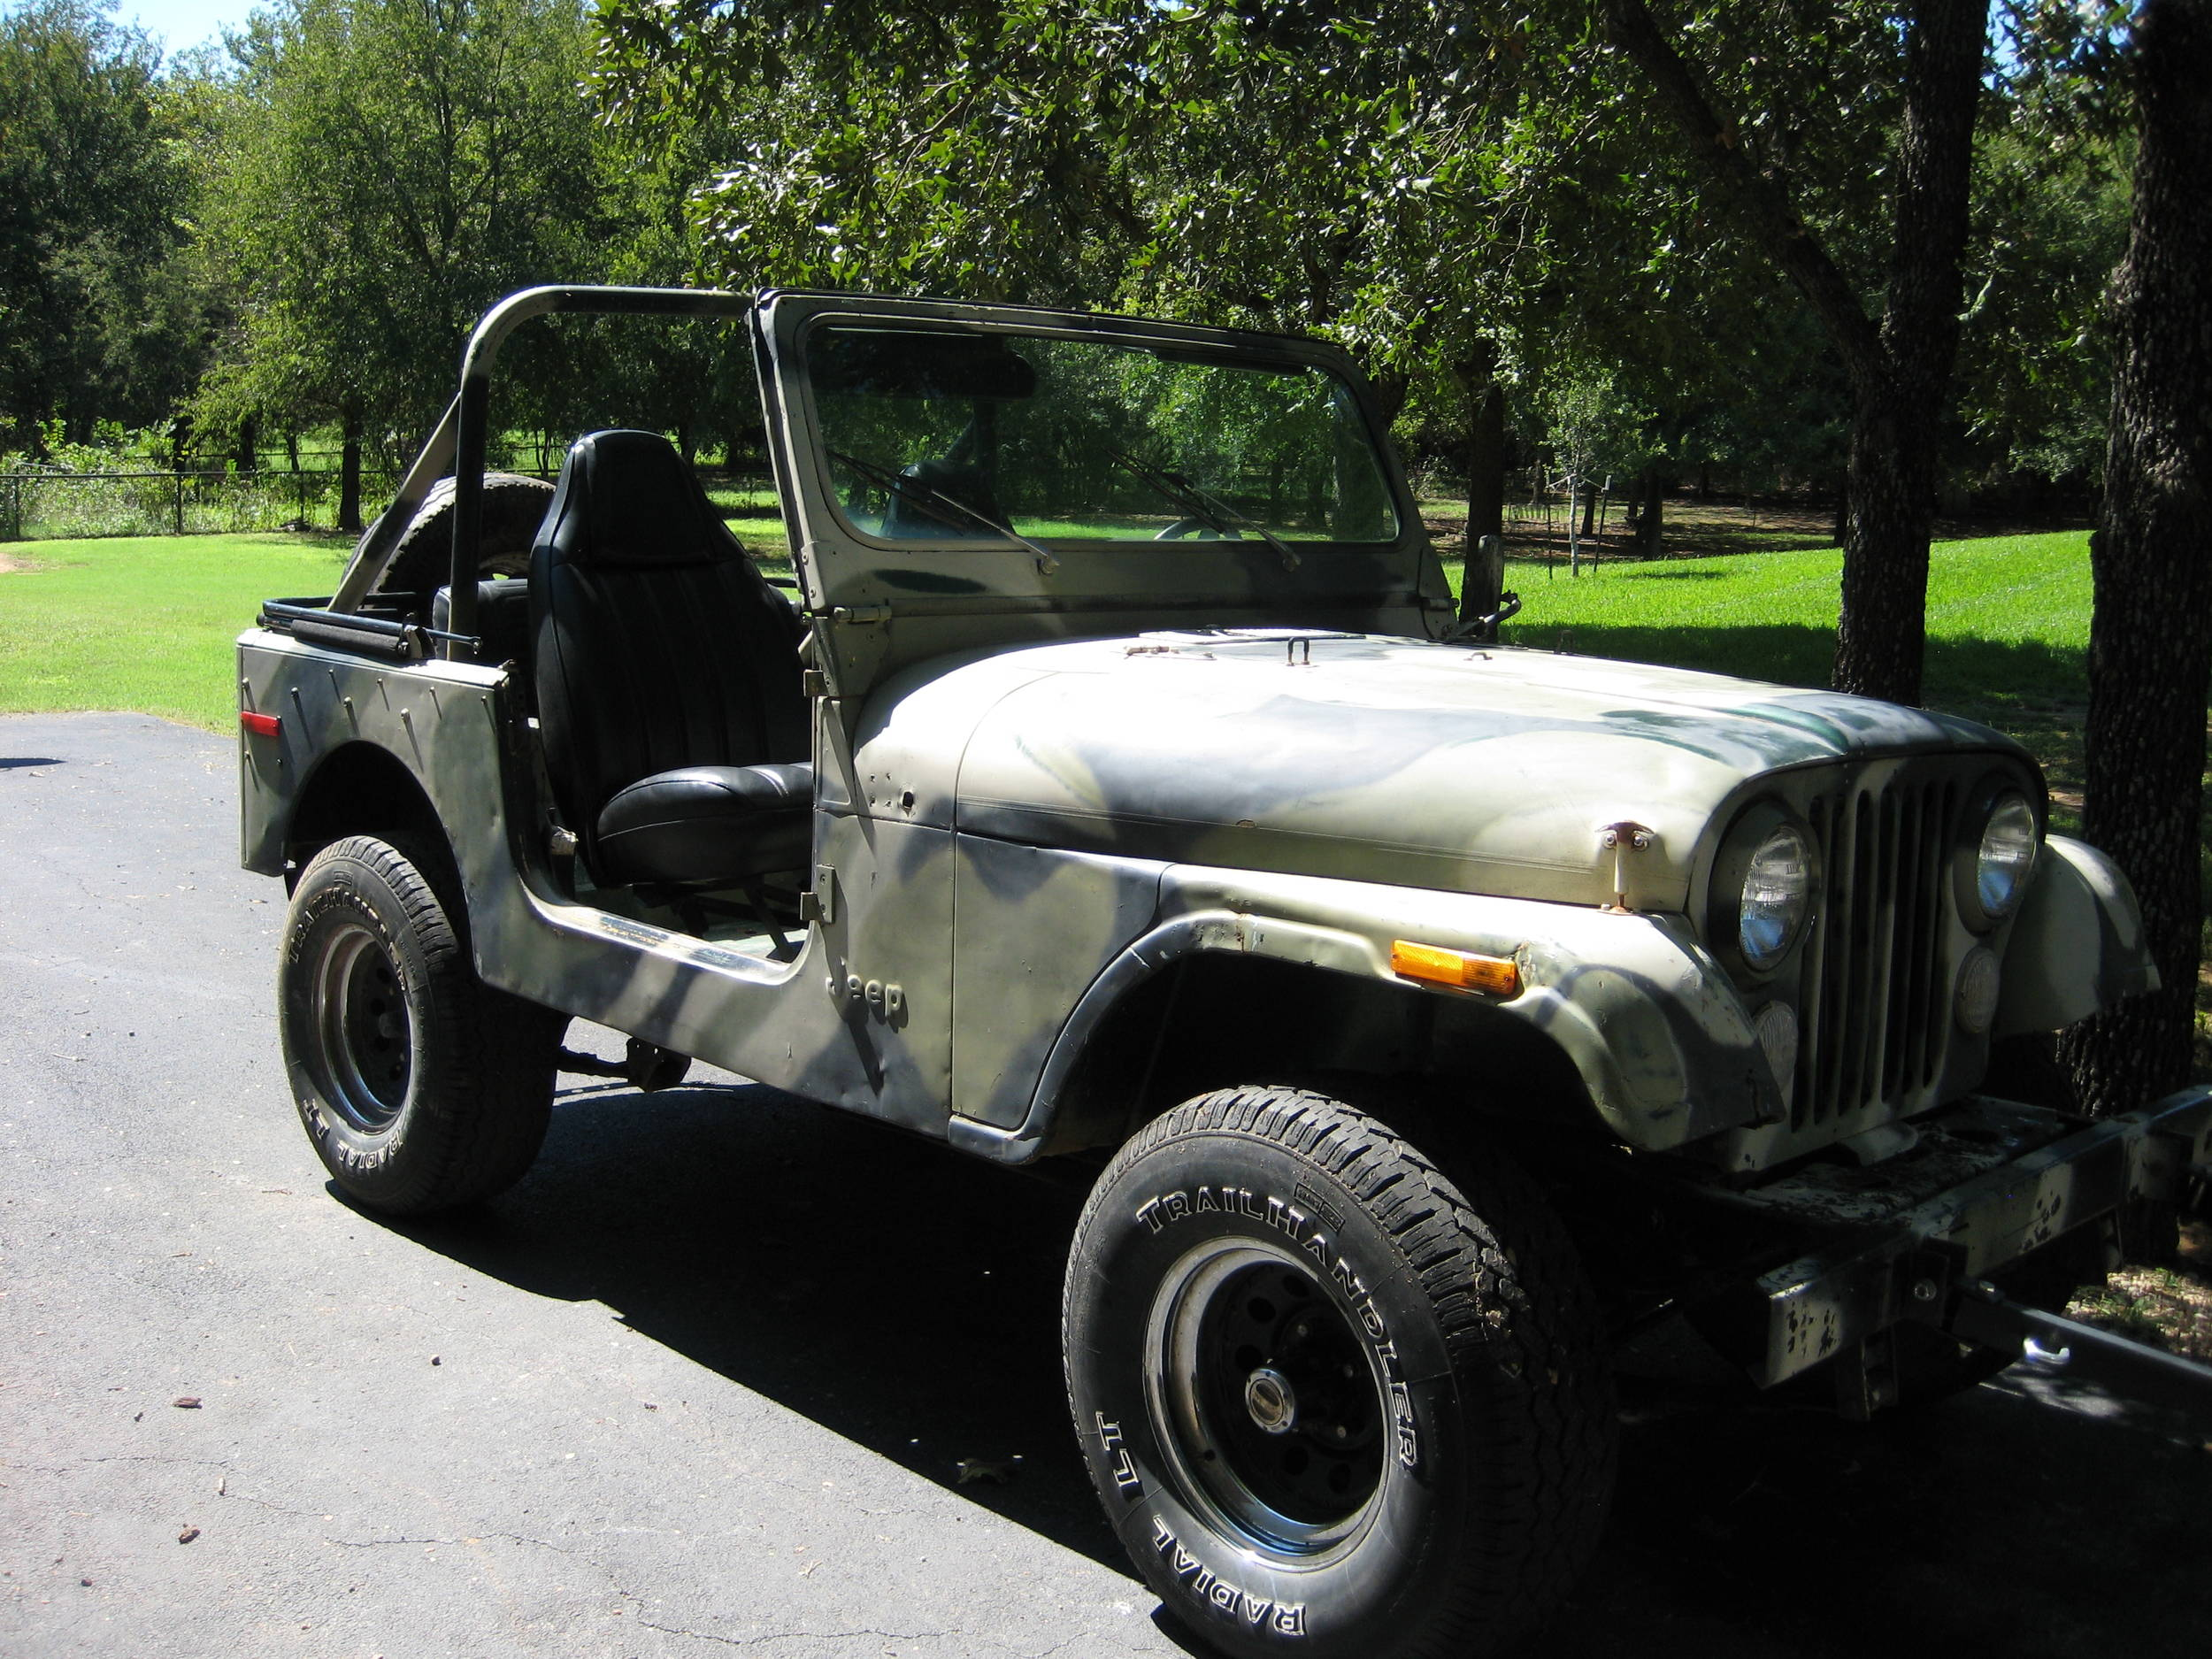 Hunting_Jeep1.JPG